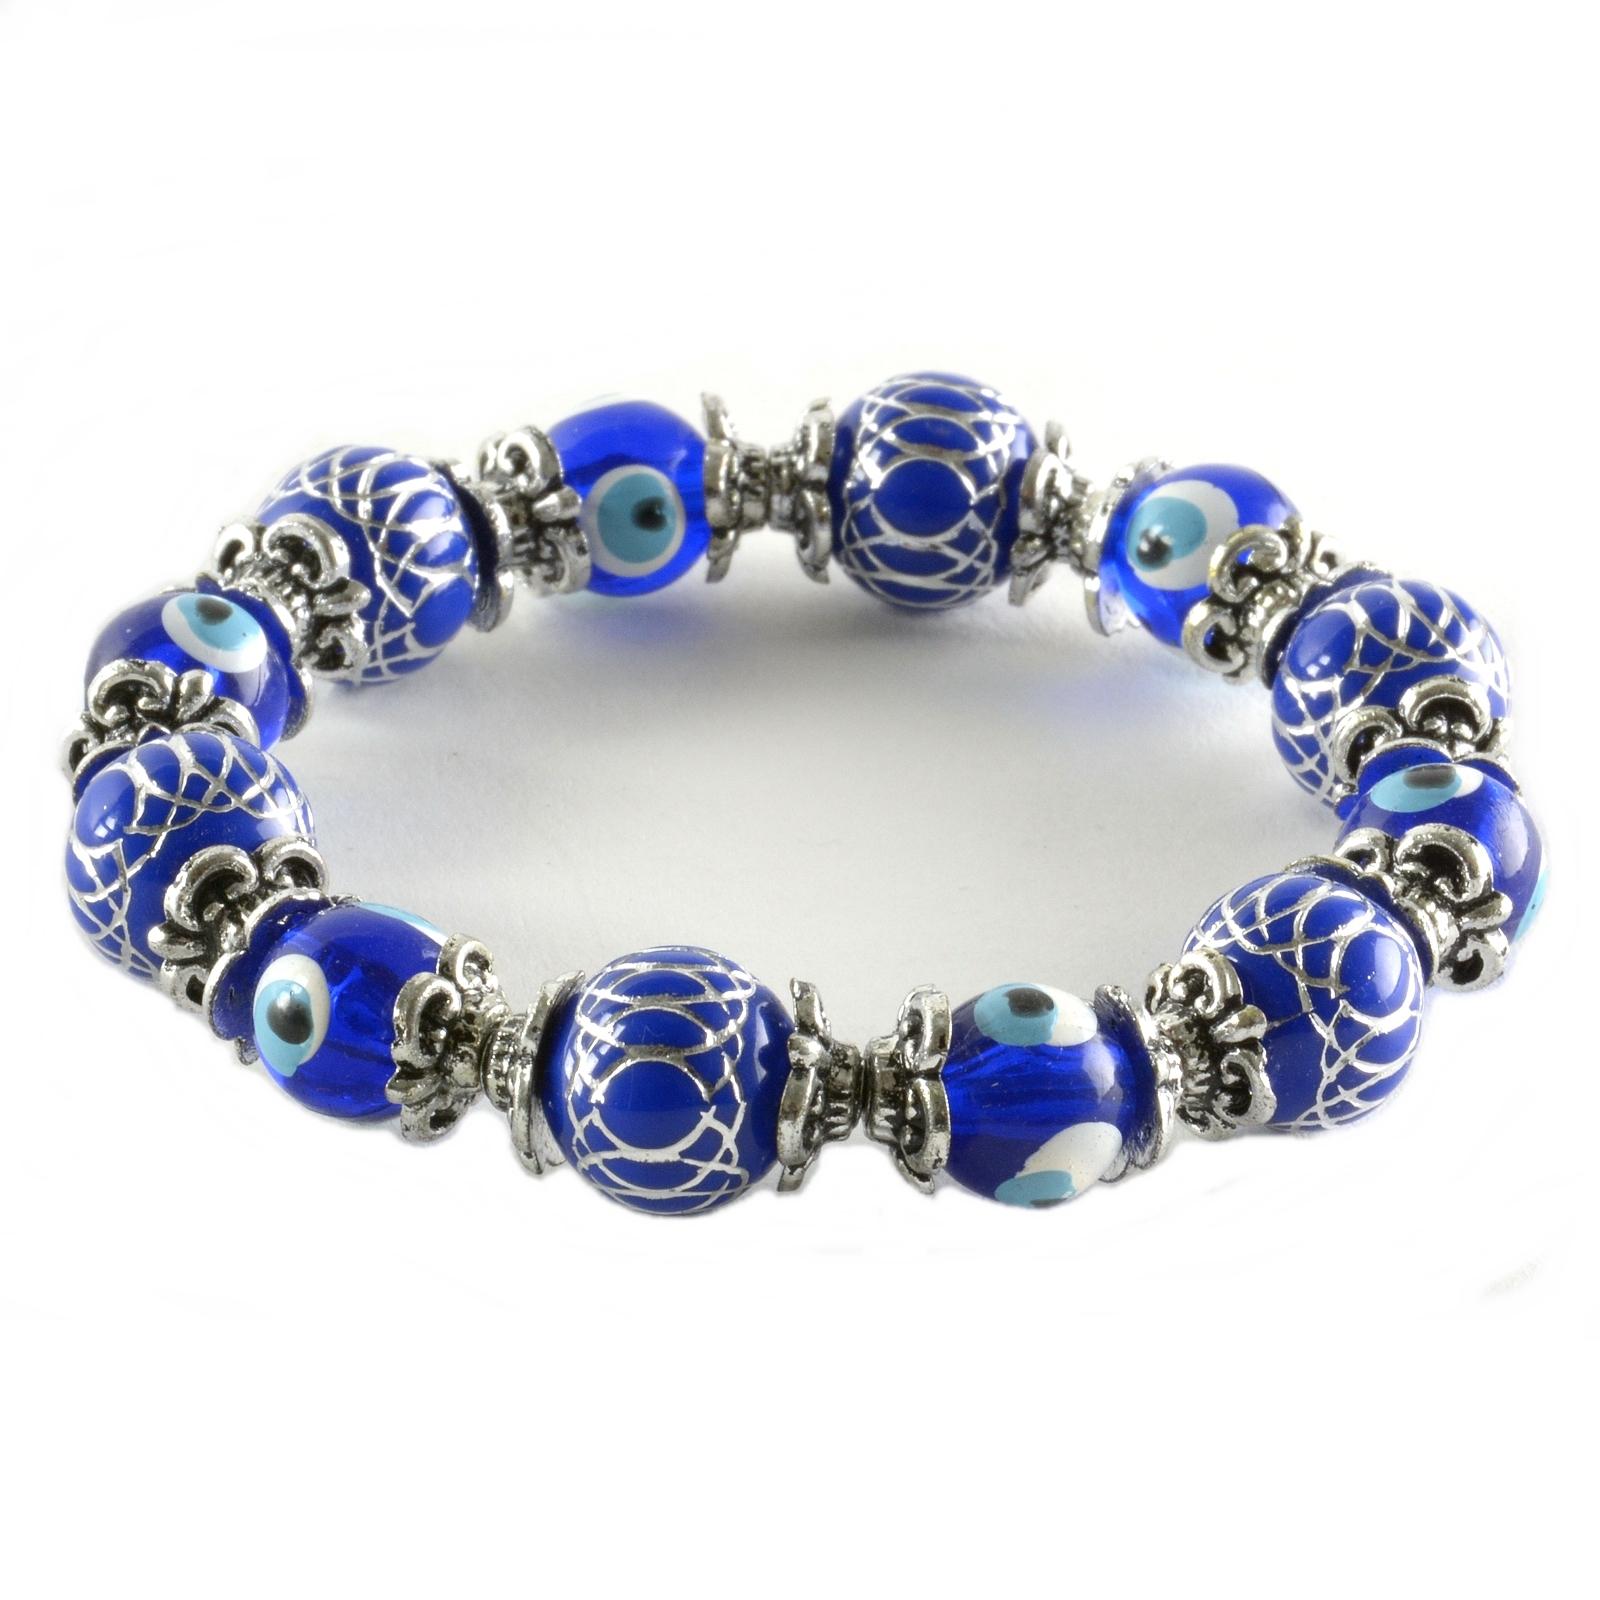 Charm Bracelet Evil Eye Good Luck Beads Nazar Boncuk